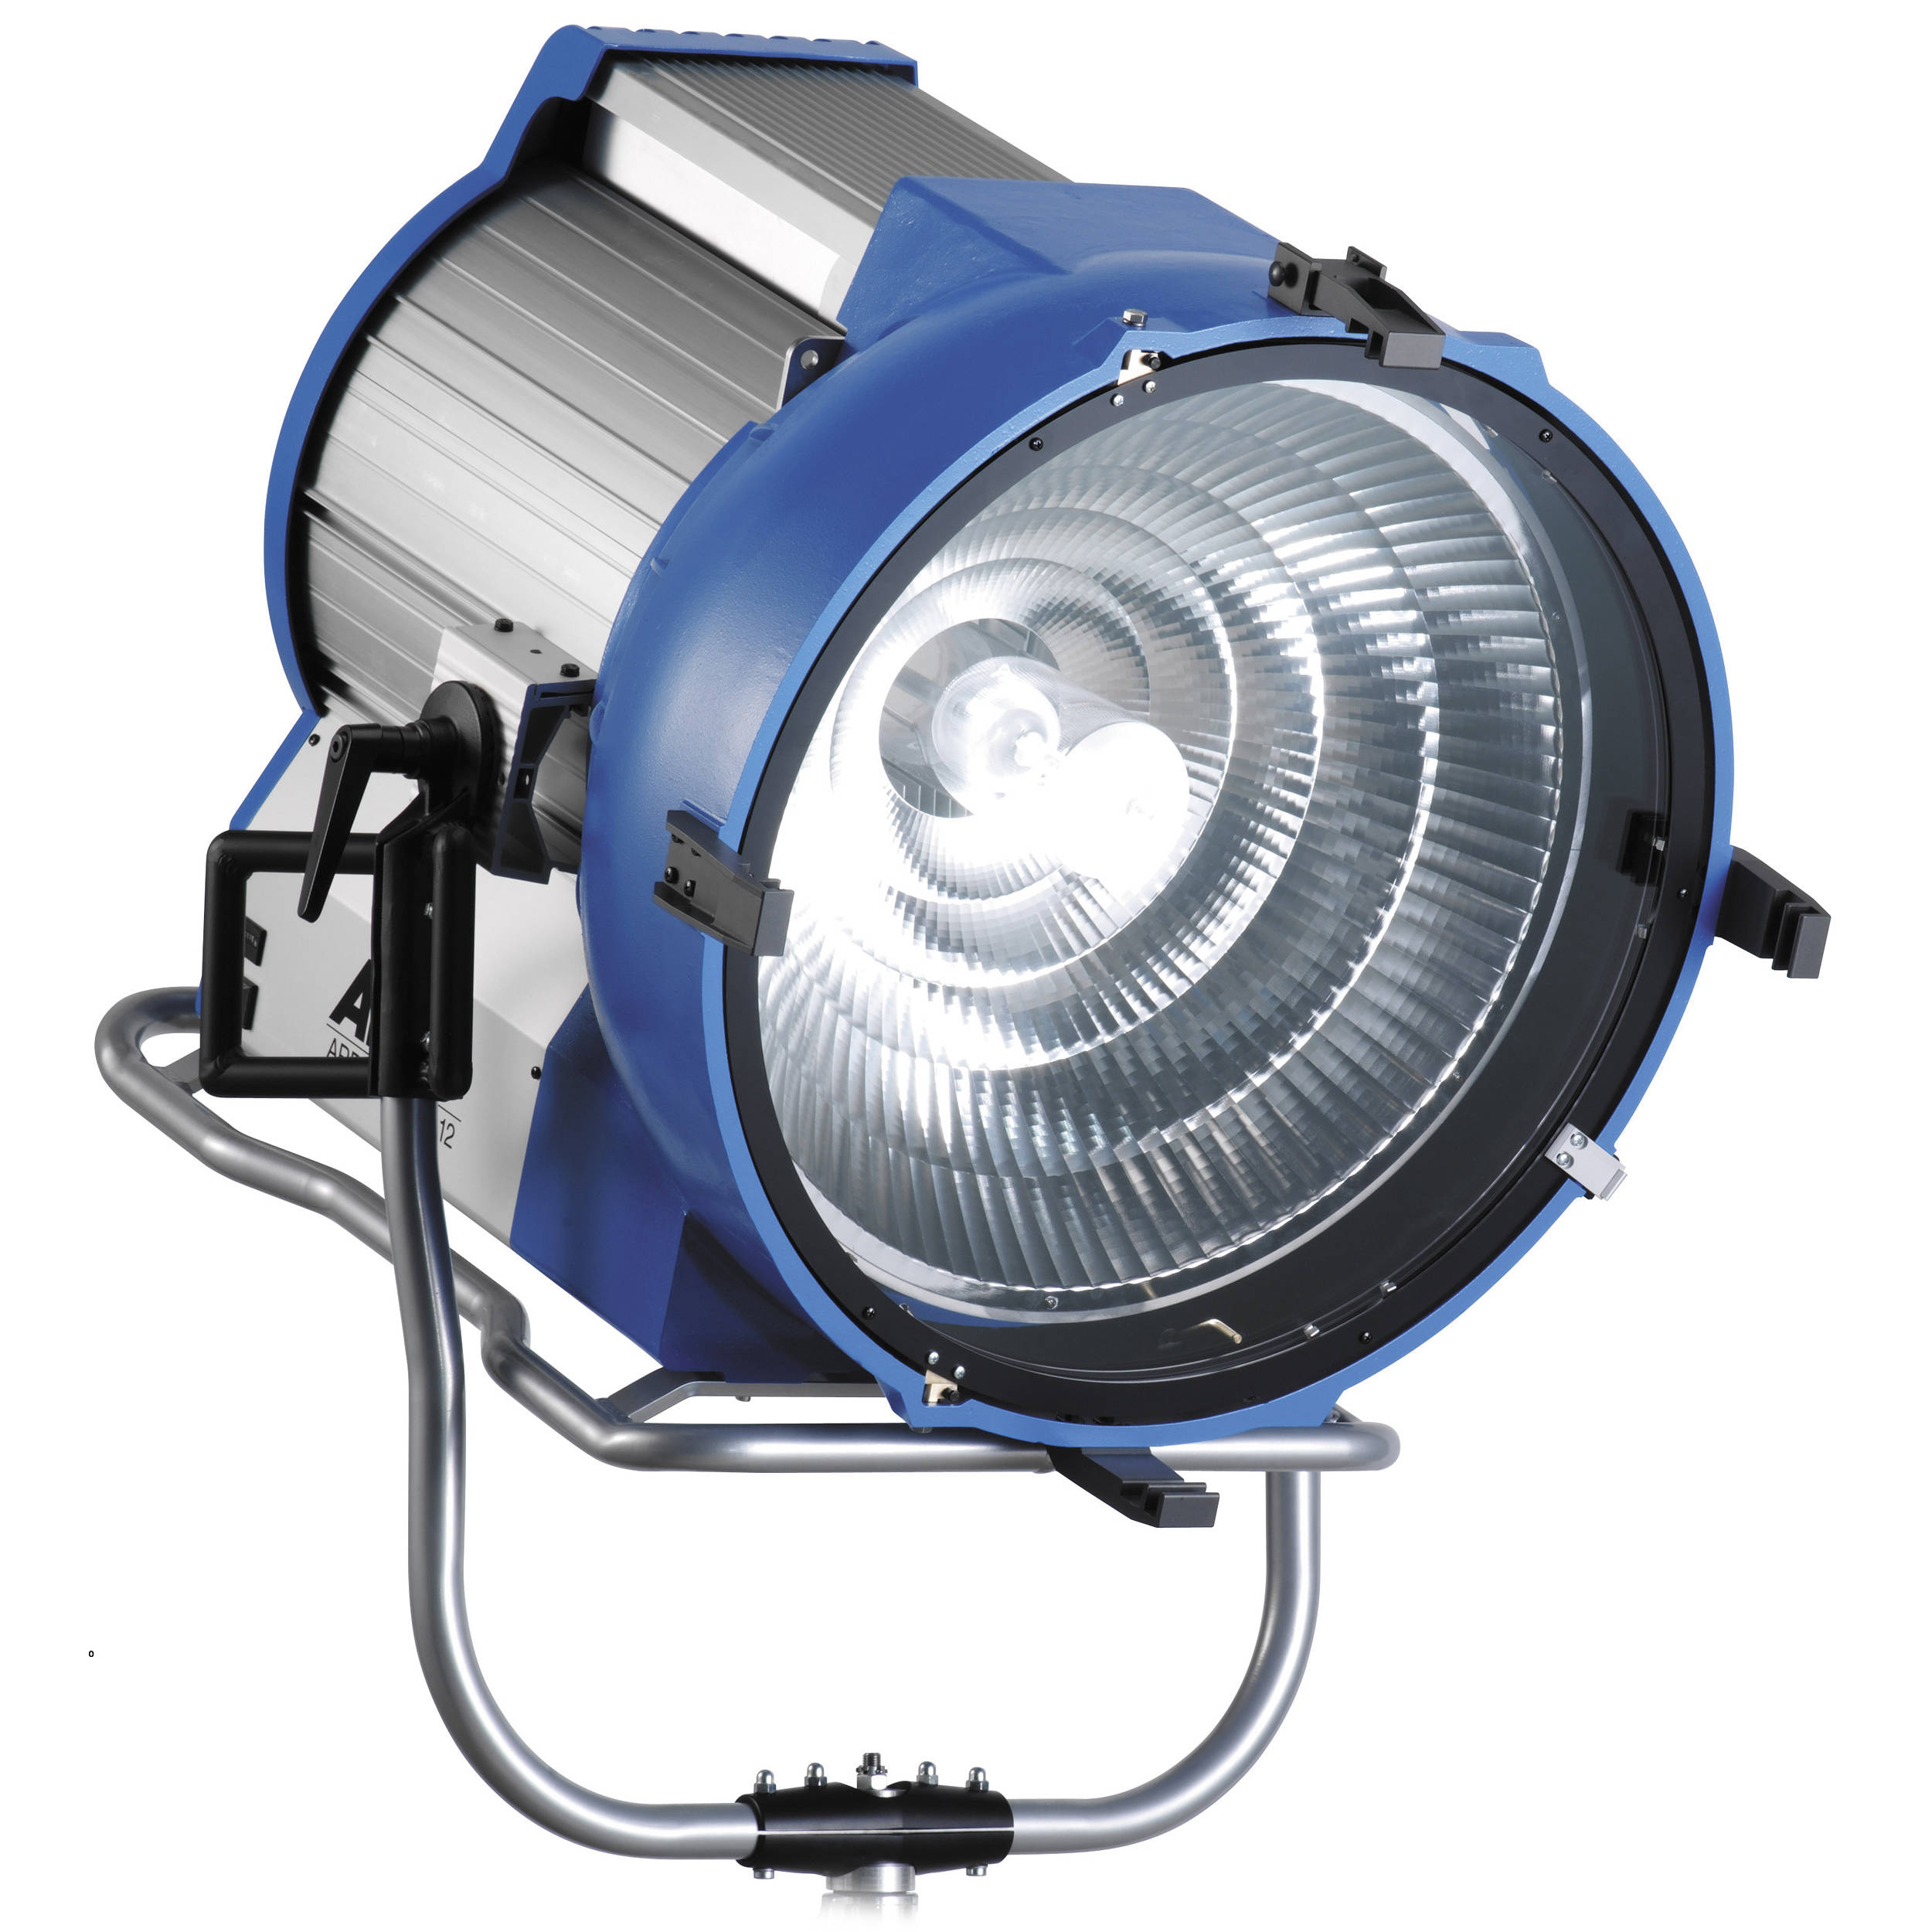 ARRI M-Series Arrimax 18/12 HMI PAR with ALF/DMX Electrical Ballast  sc 1 st  Bu0026H & ARRI M-Series Arrimax 18/12 HMI PAR with ALF/DMX L0.0006596 Bu0026H azcodes.com